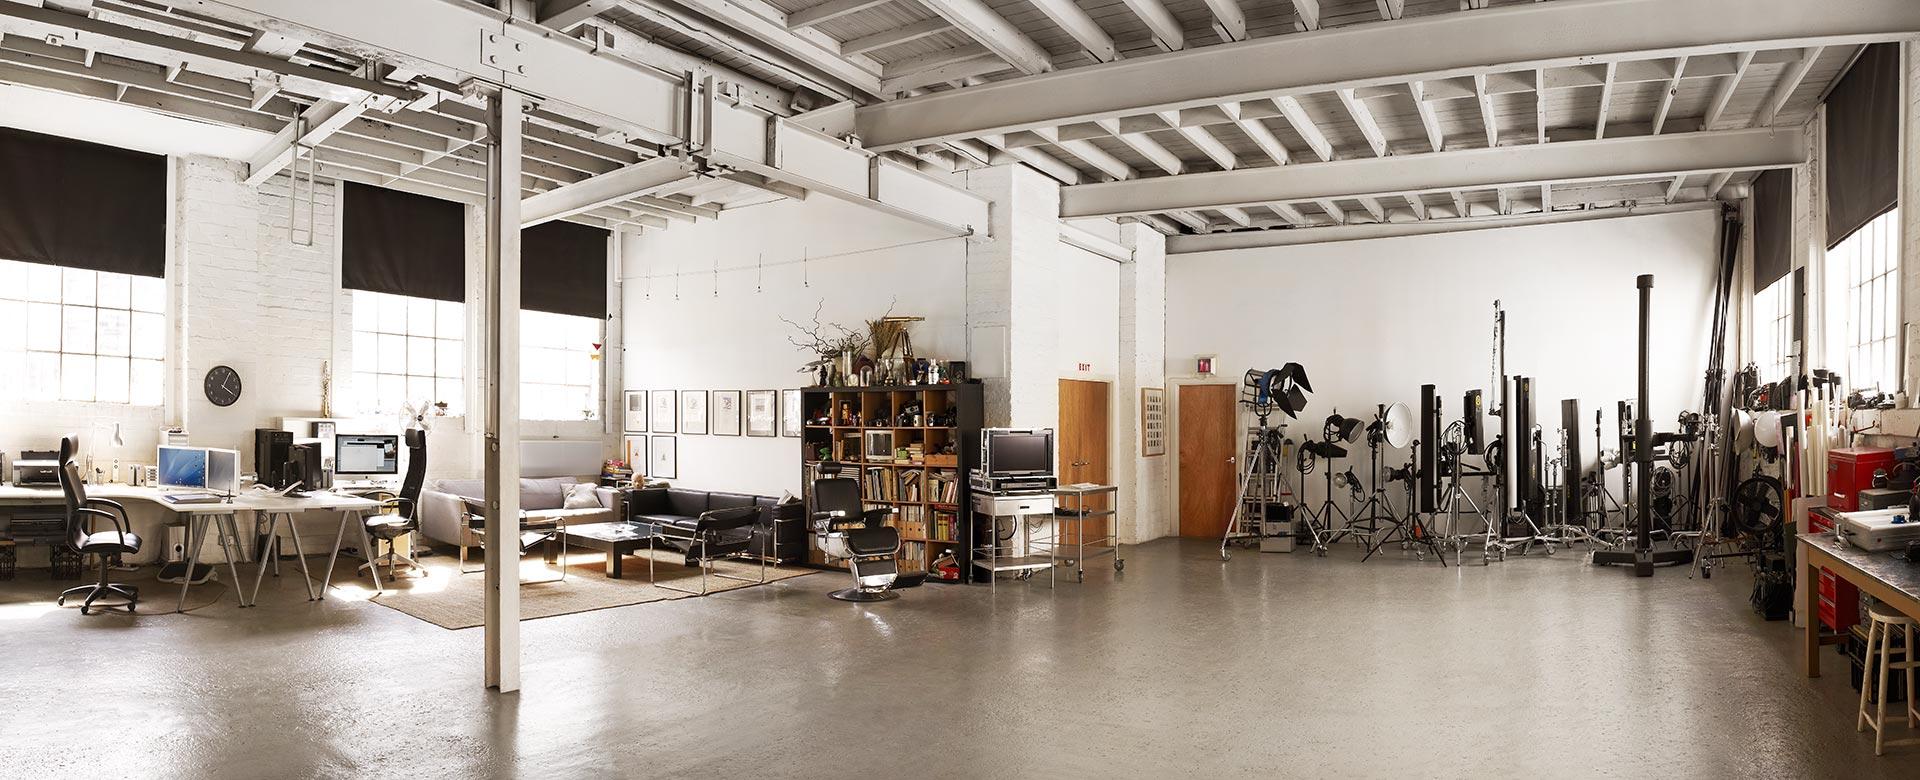 Studio-image-low-res.jpg